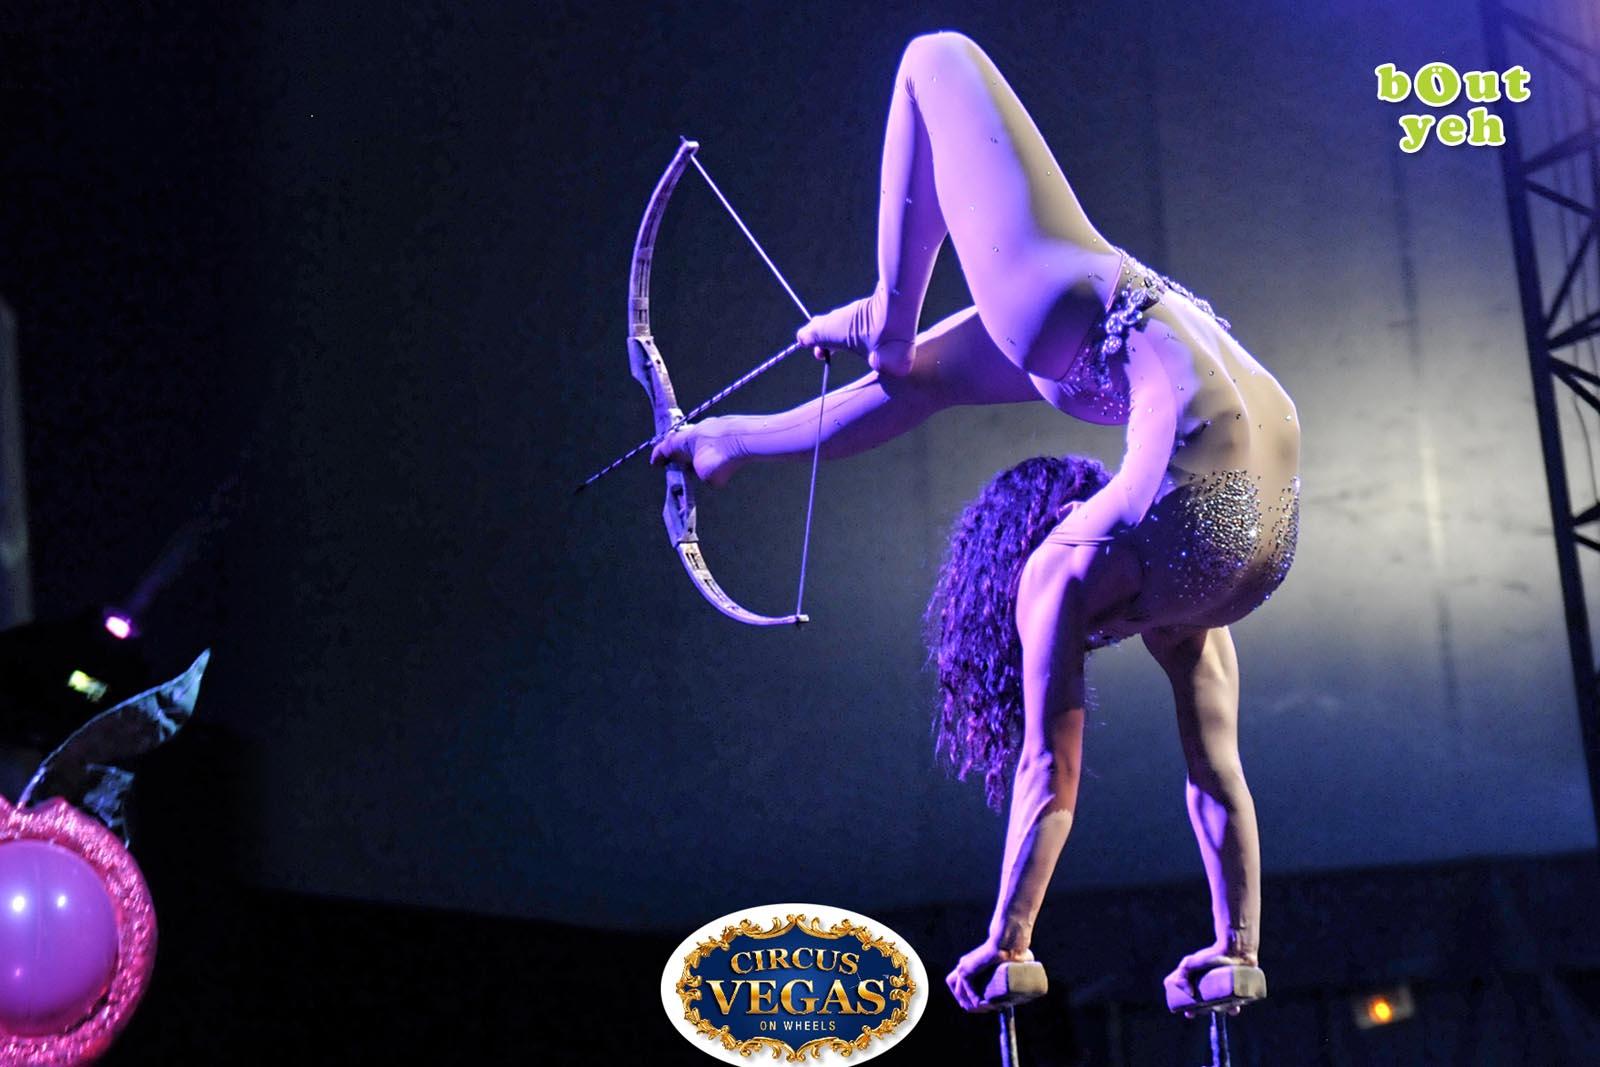 Social Media Marketing Consultants Belfast - Circus Vegas campaign photo of circus acrobat. Photo by Bout Yeh used in a Social Media Marketing campaign across Bout Yeh's Social Media platforms for Circus Vegas On Wheels Ireland